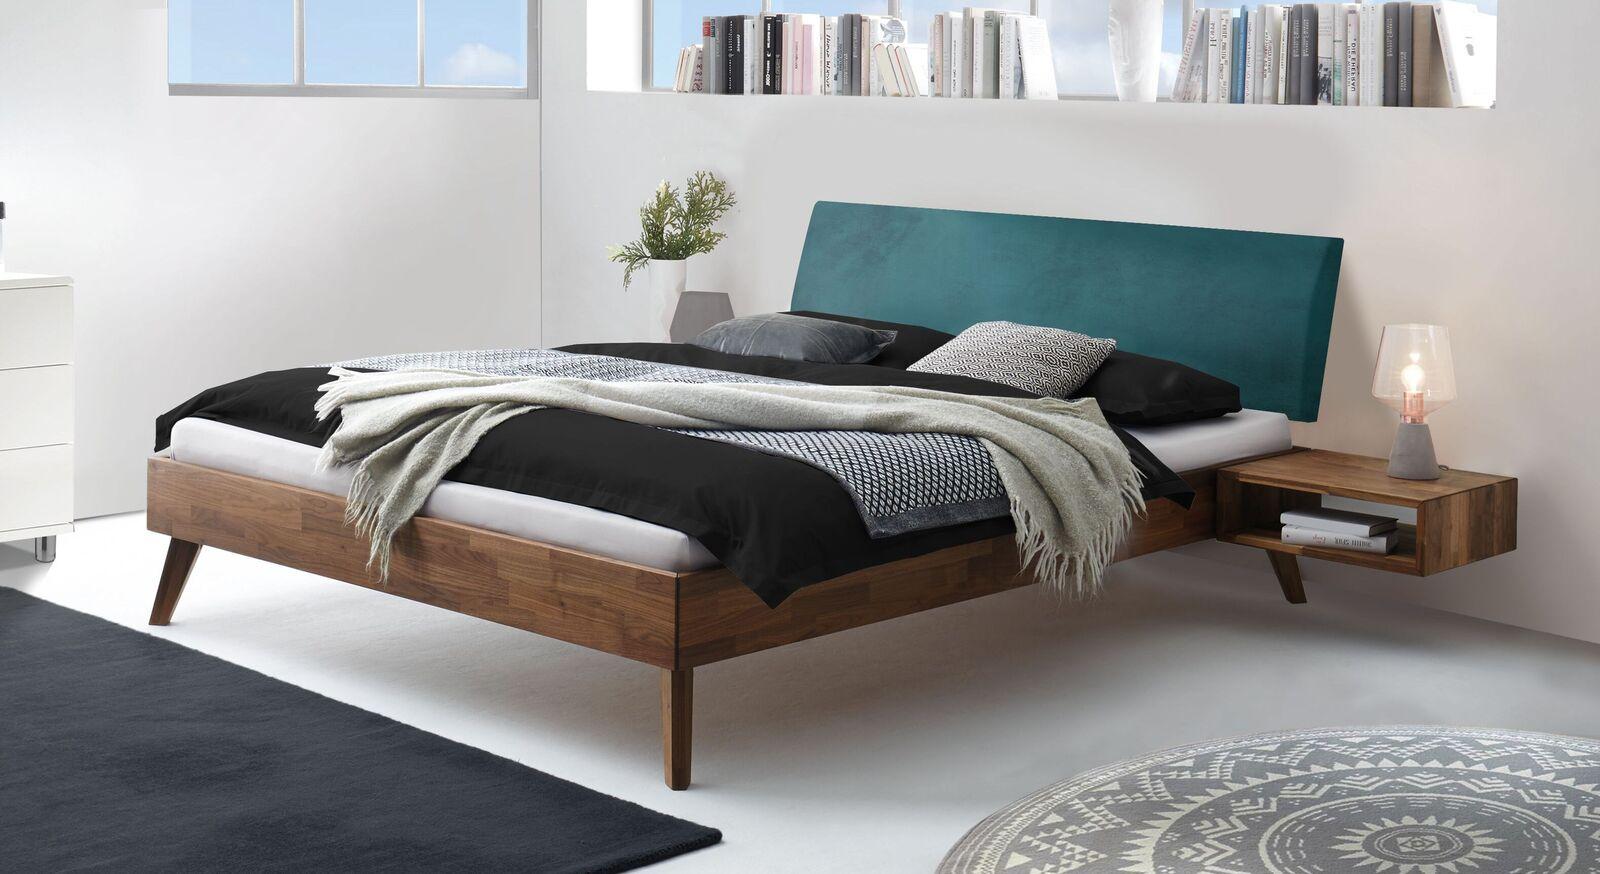 Bett Cailin aus Nussbaum-Holz